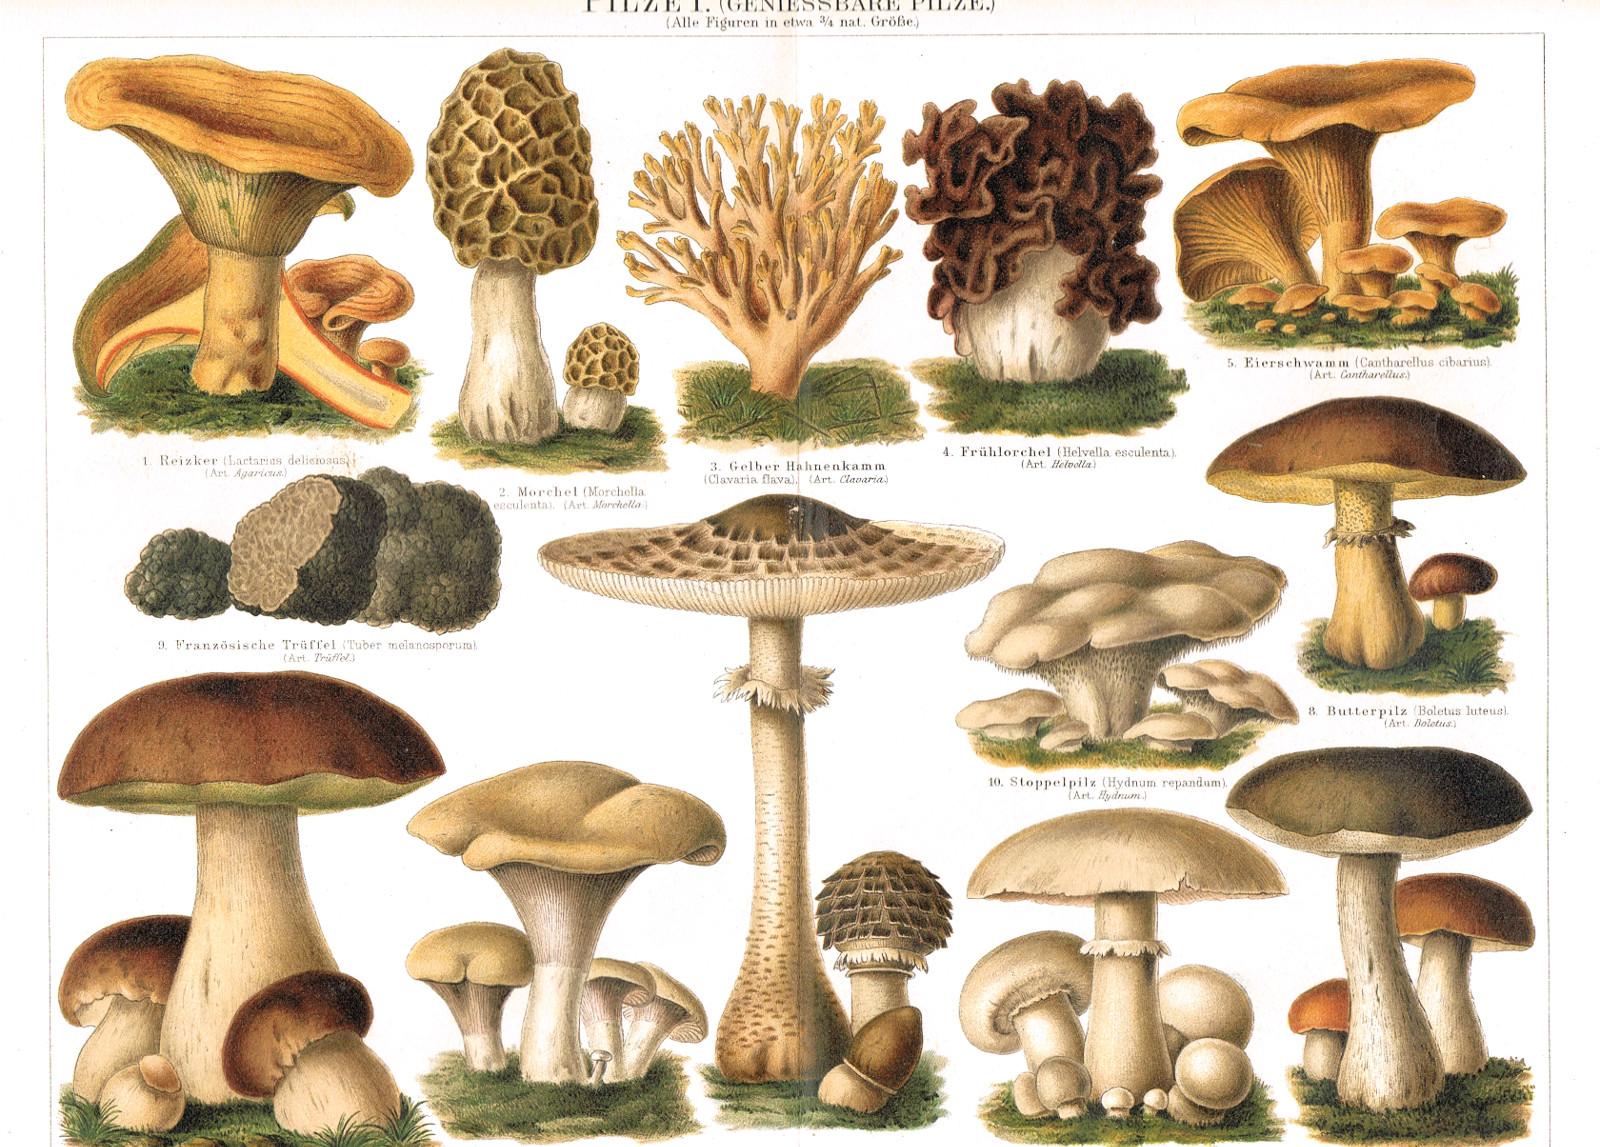 pilze essbar lithographie 1906 genie baere mykologie mushrooms edible ebay. Black Bedroom Furniture Sets. Home Design Ideas